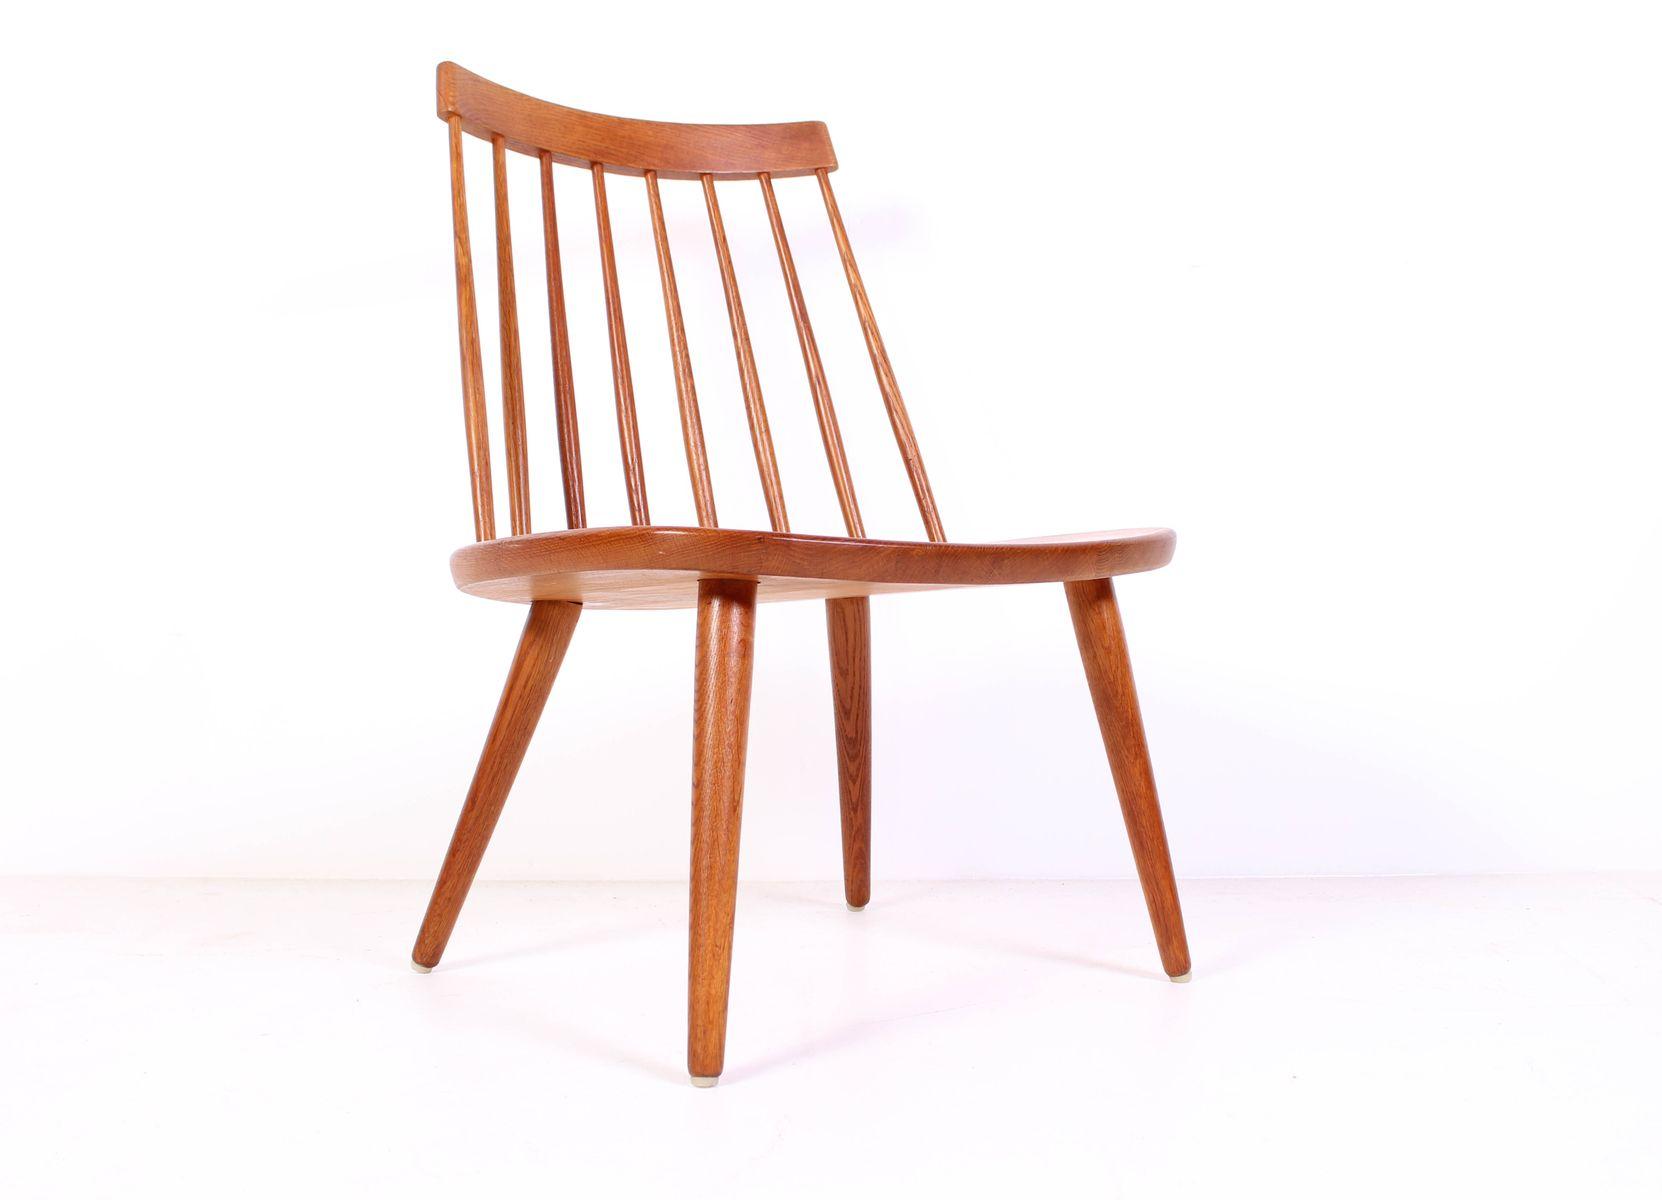 mid century eichenholz sibbo stuhl von yngve ekstr m f r stolab bei pamono kaufen. Black Bedroom Furniture Sets. Home Design Ideas